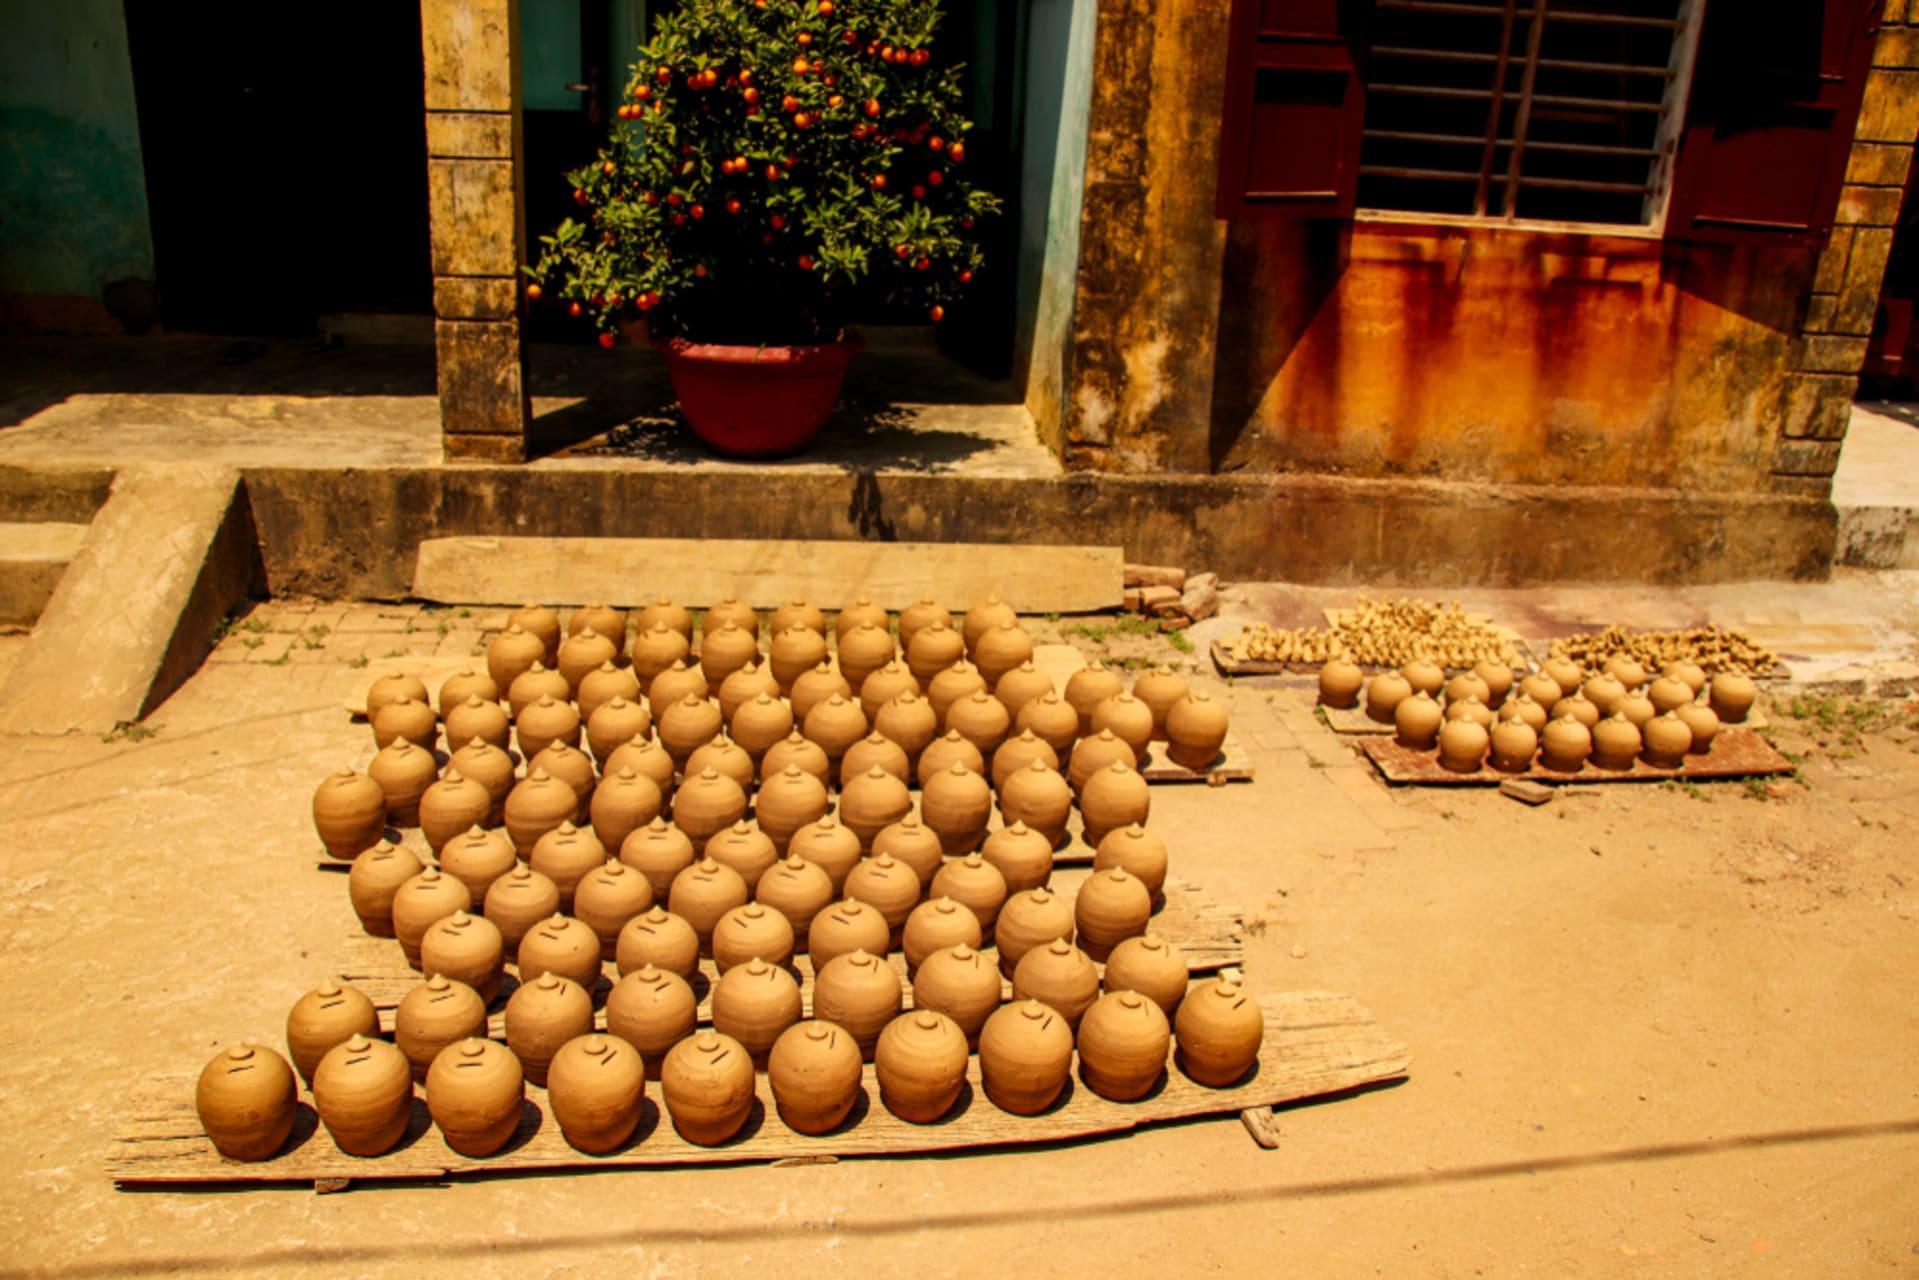 Hội An - Hội An - Day 4: Visit a Pottery Village